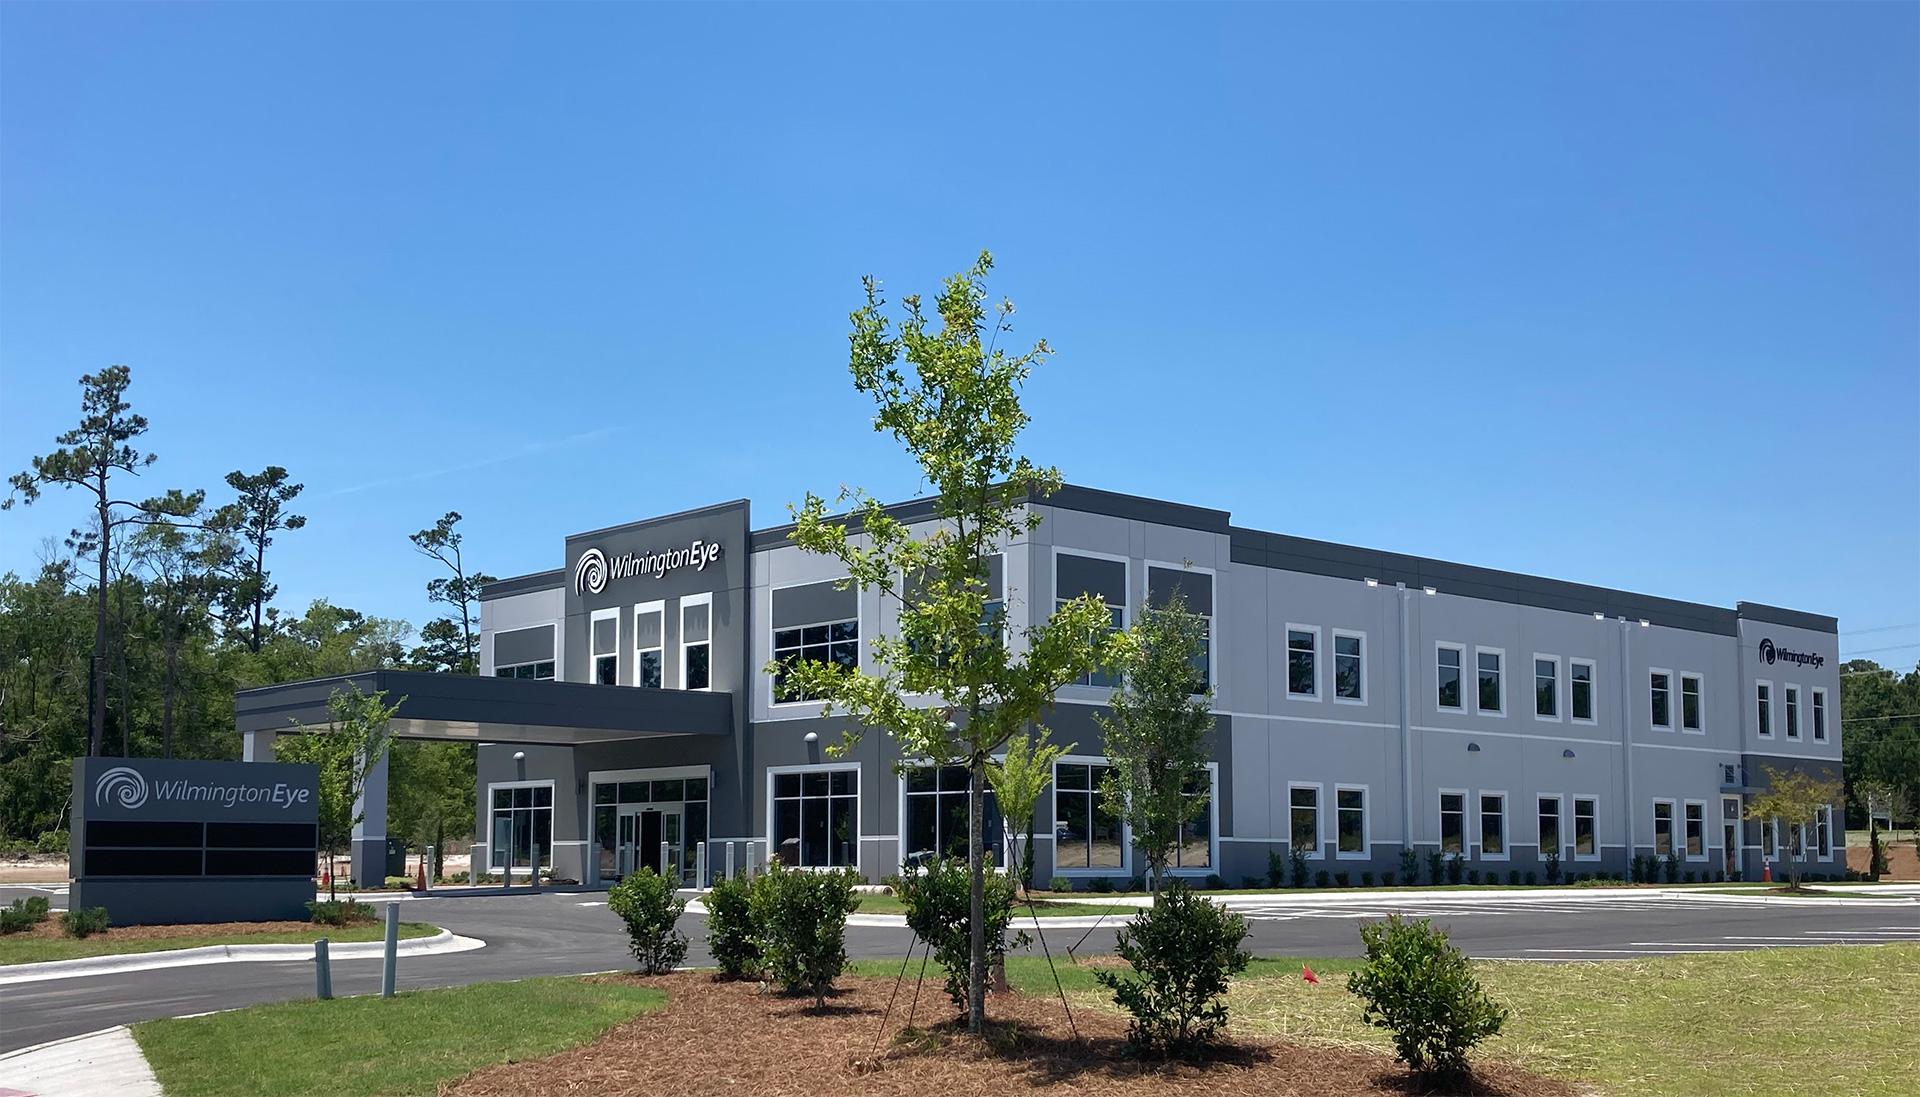 Wilmington Eye – Wilmington, NC